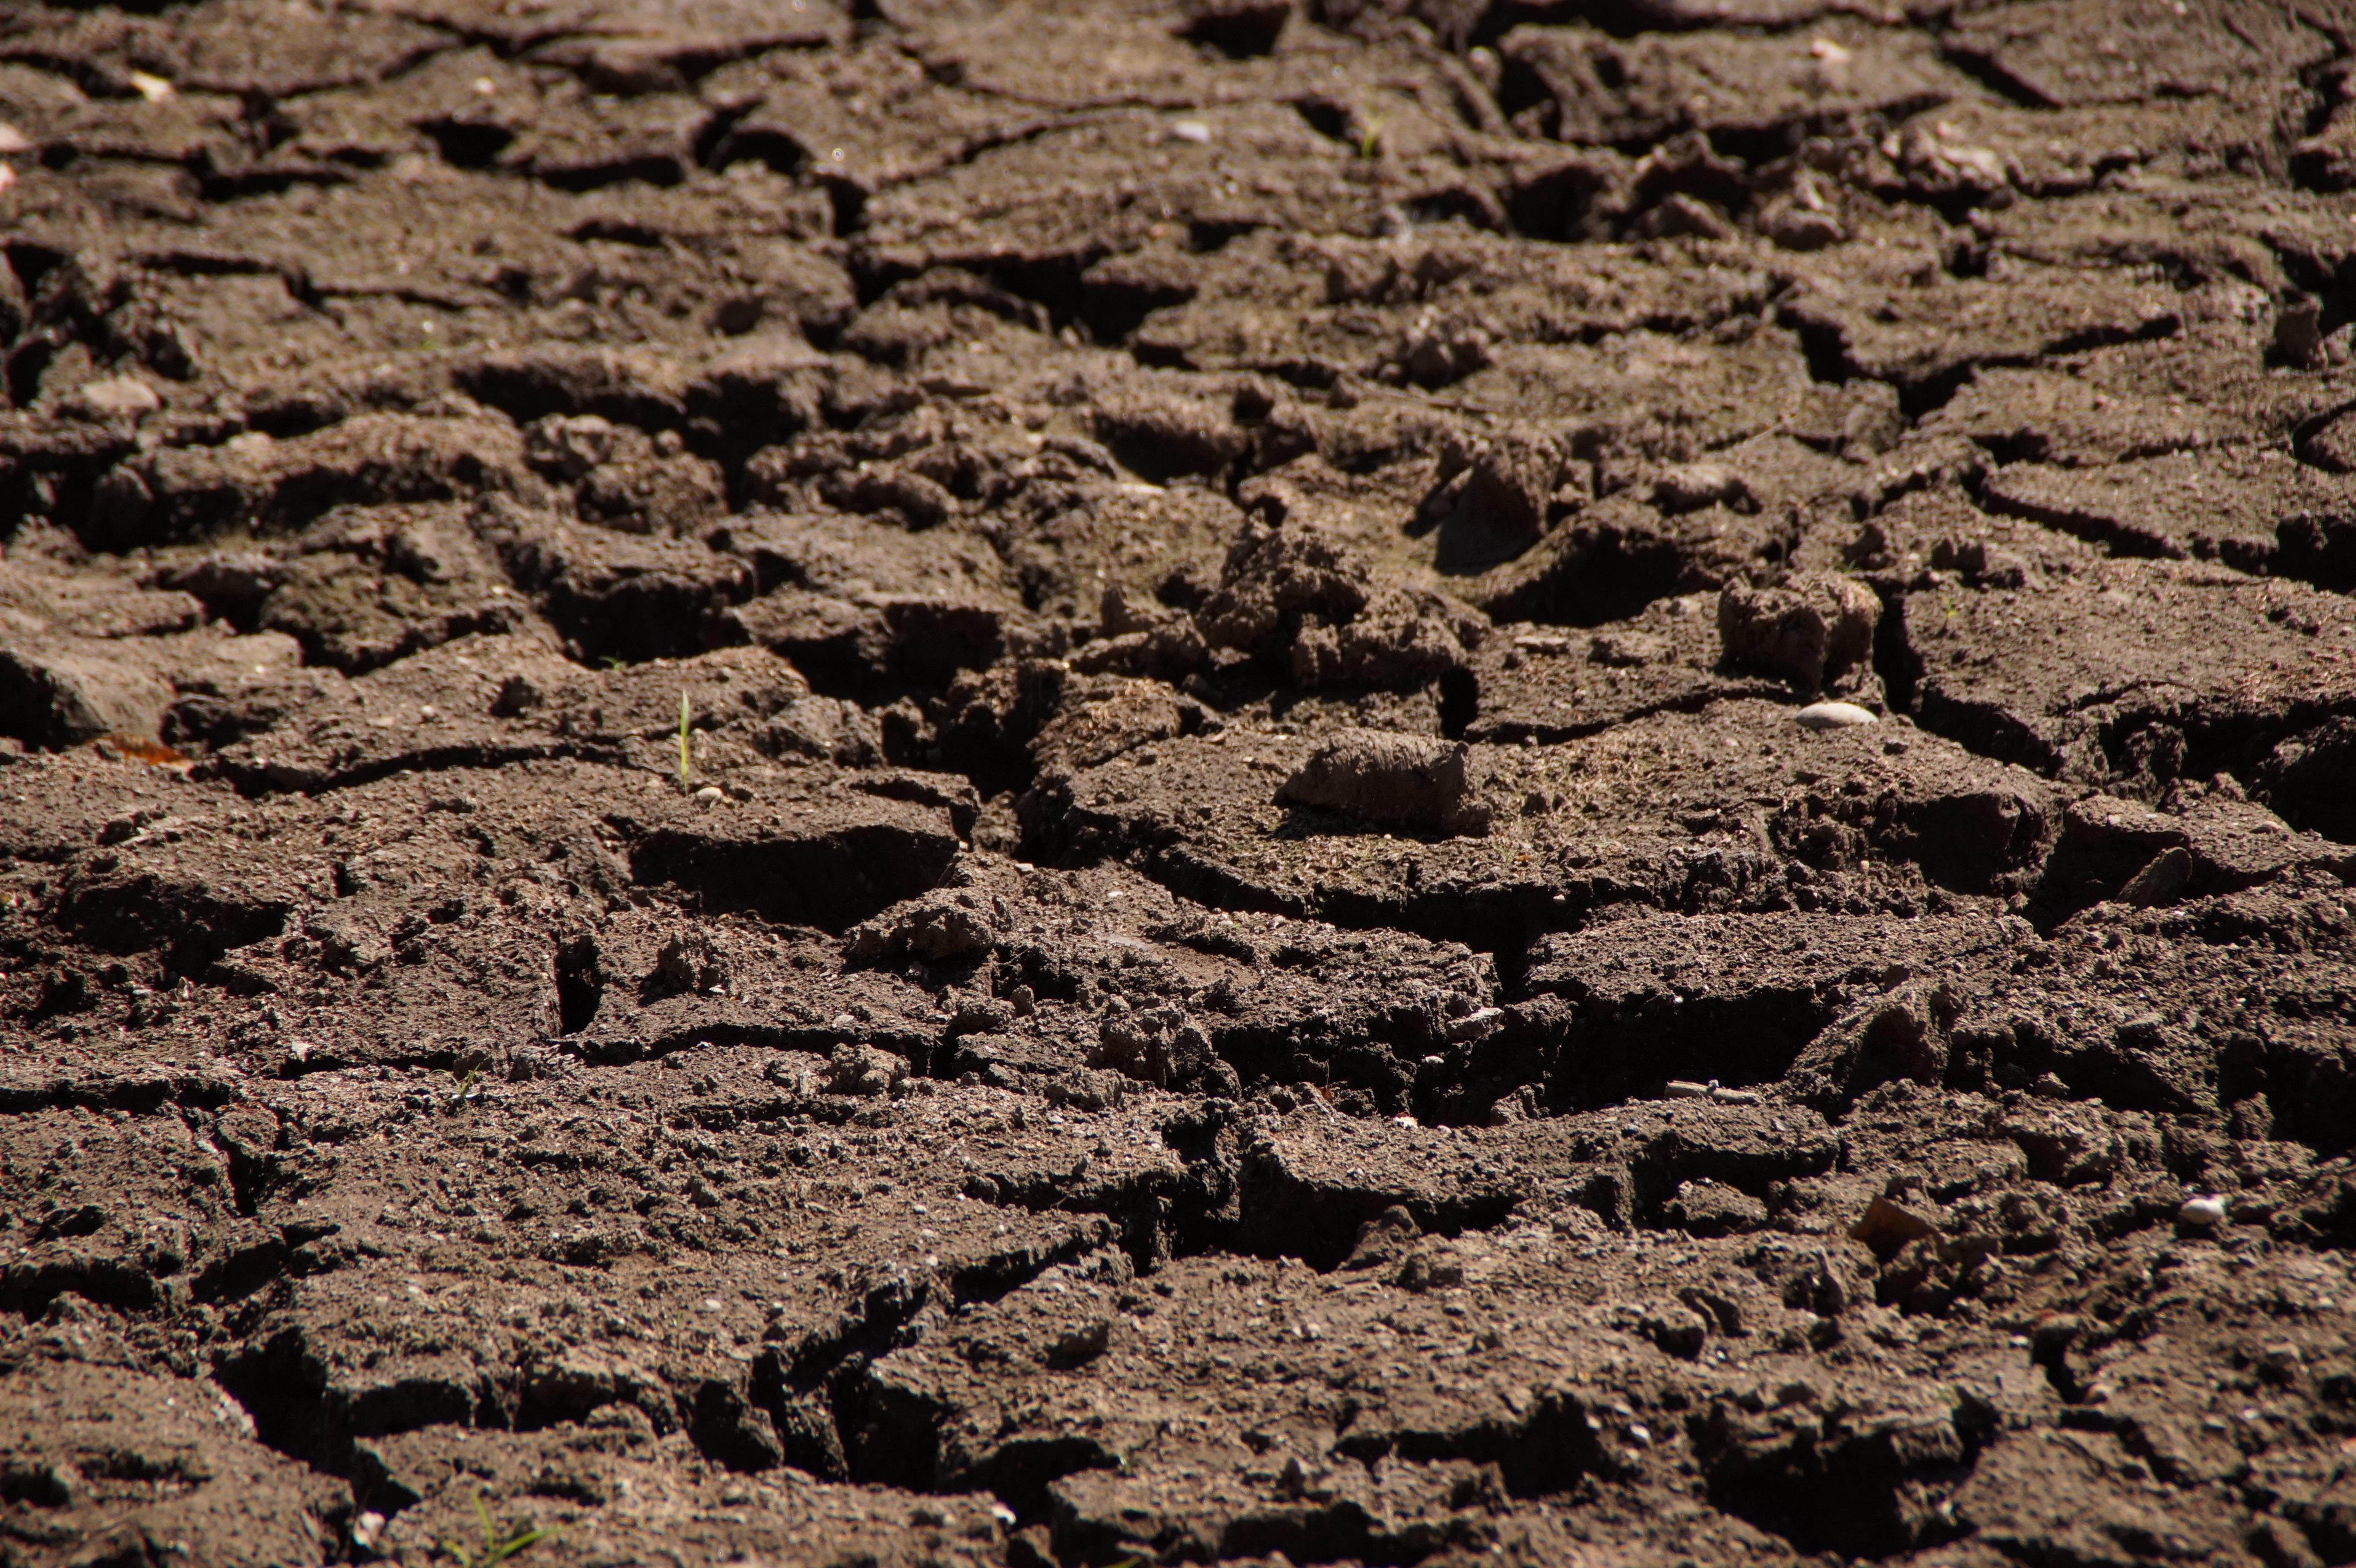 фото или картинки почв кавказе так